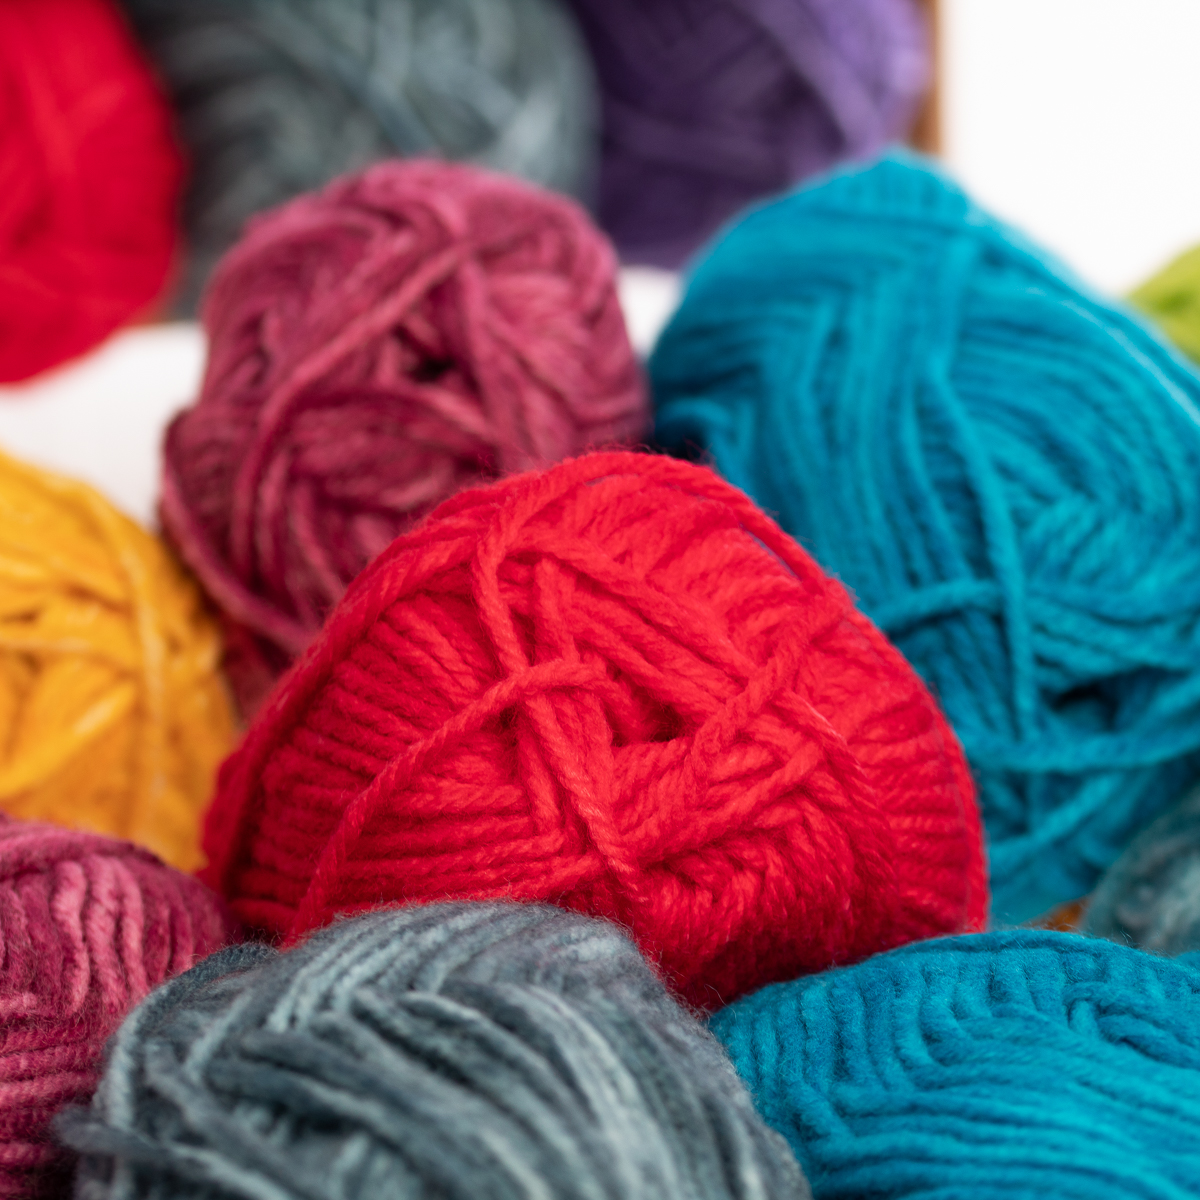 3pk-Lion-Brand-Yarn-Acrylic-amp-Wool-Chunky-Yarn-Bulky-5-Soft-Knitting-Crocheting thumbnail 19